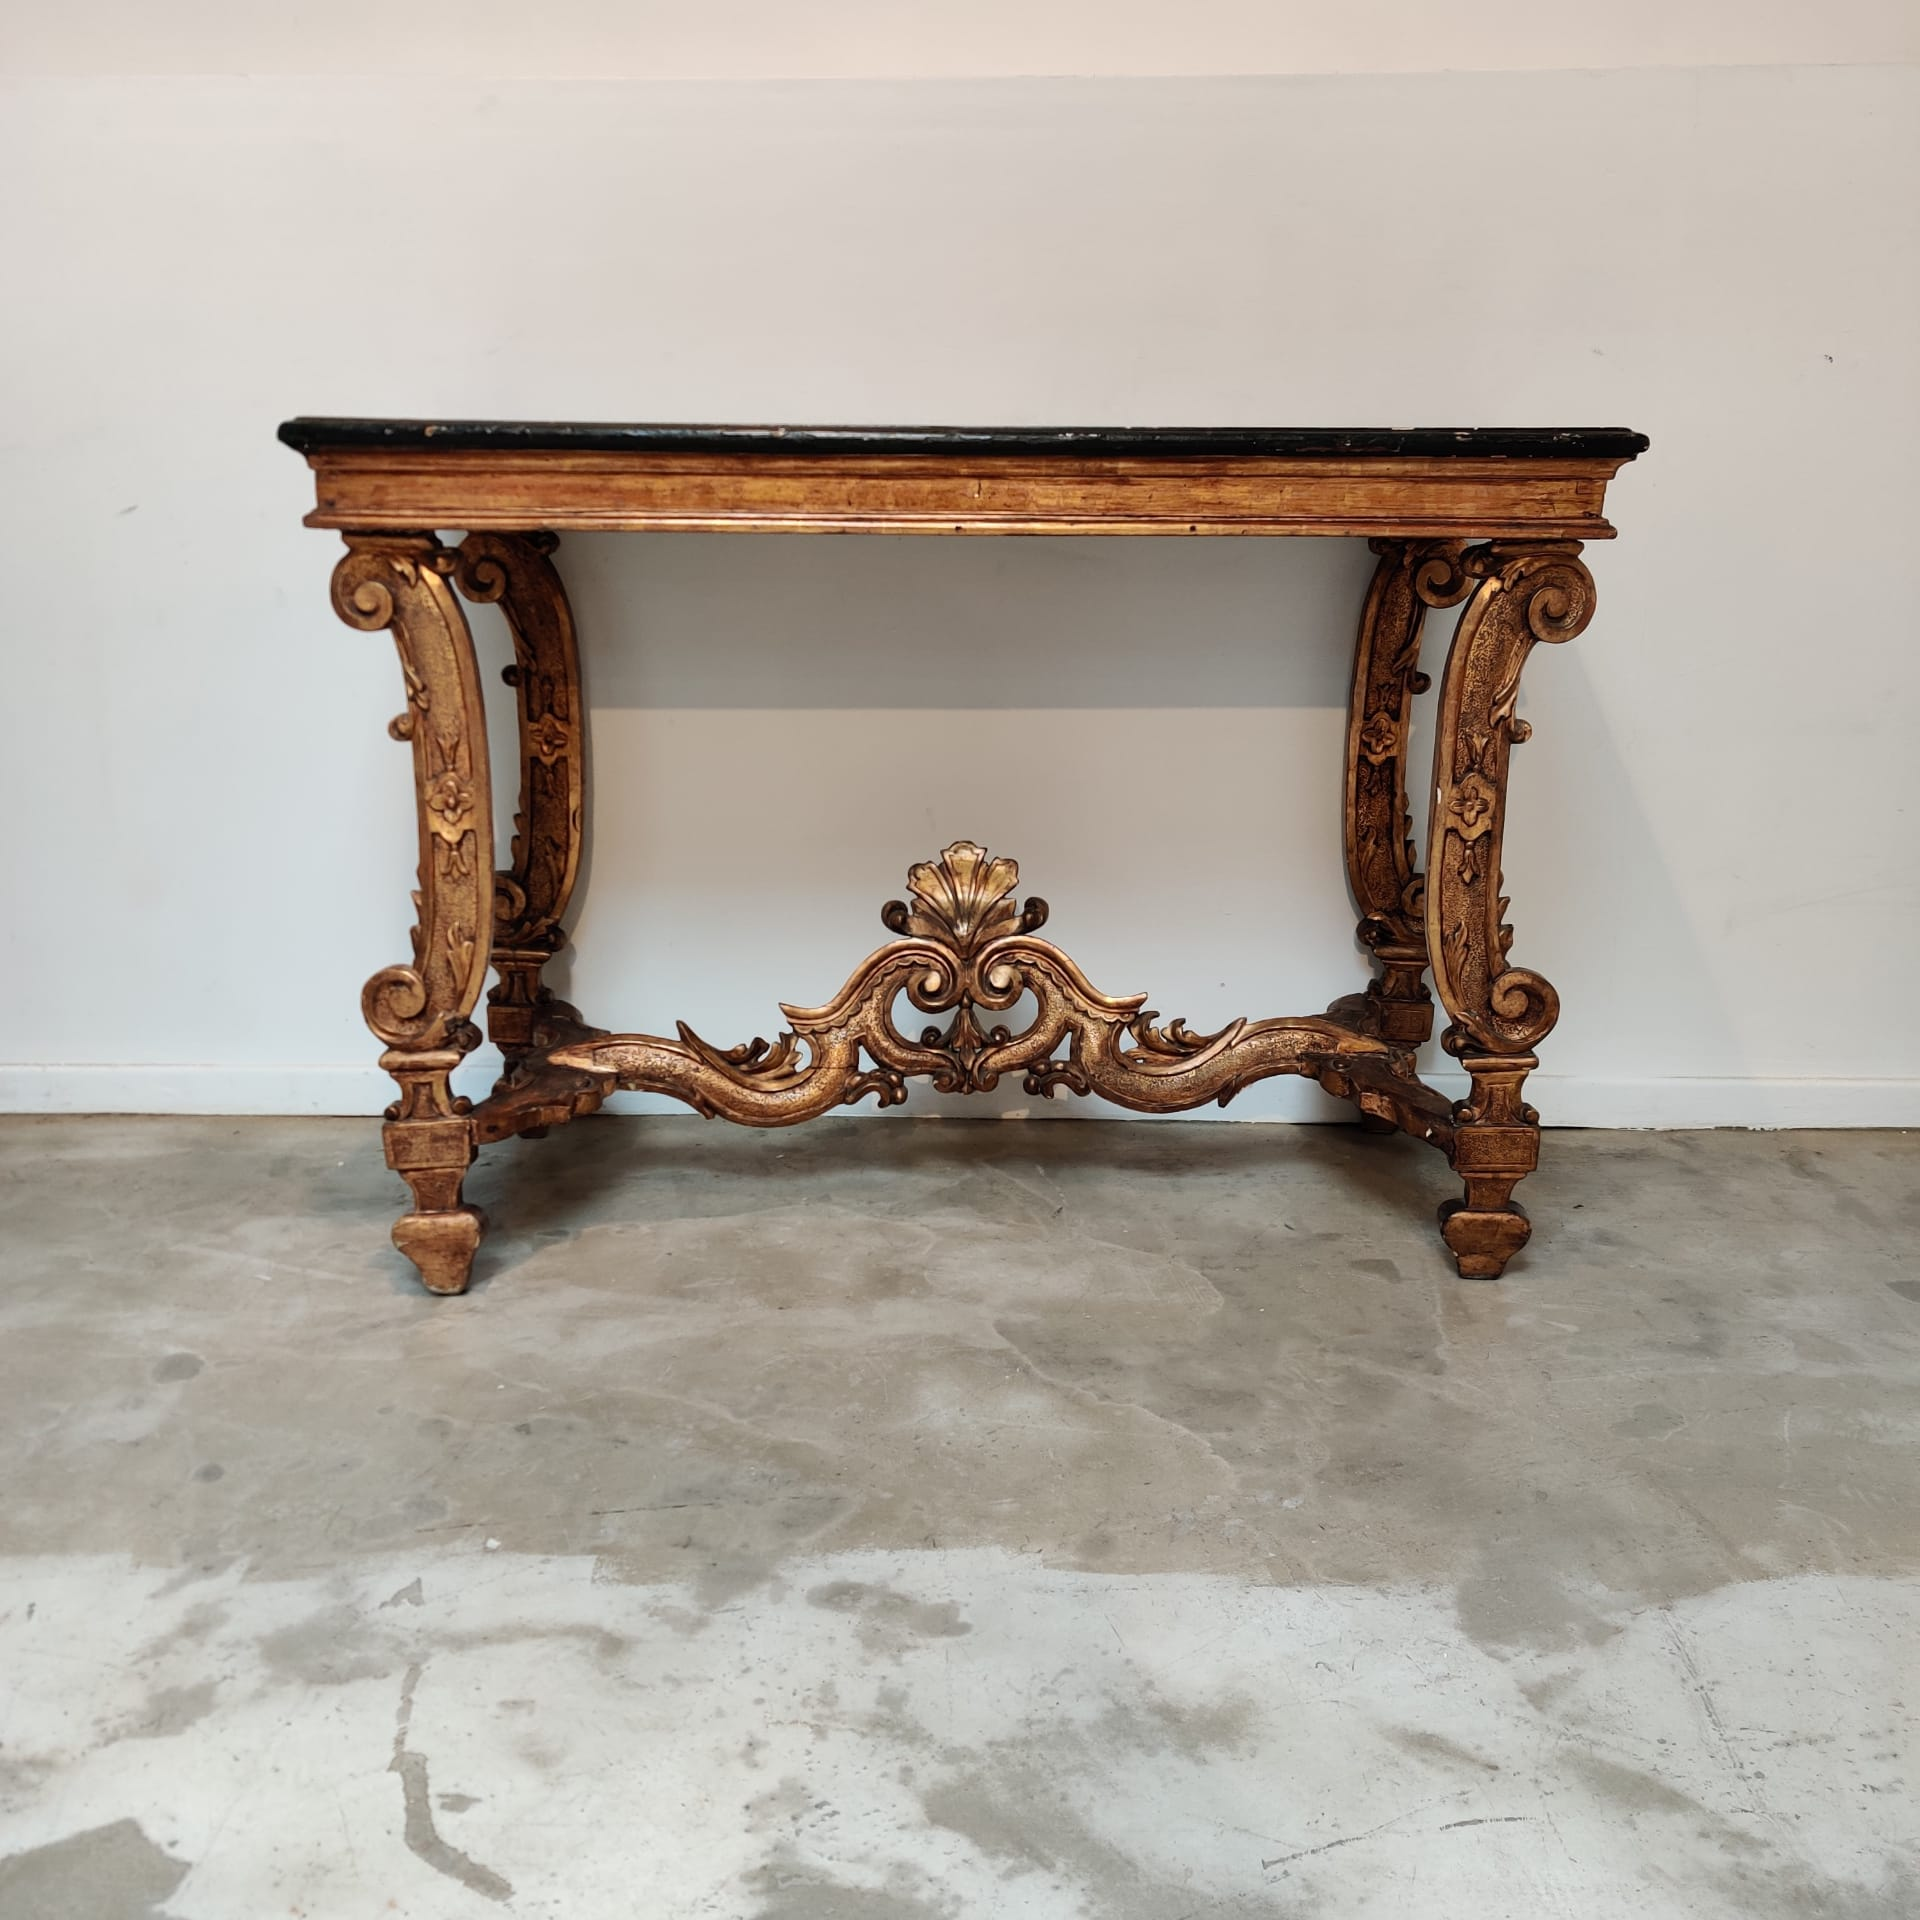 Italian XVIIIth century gilted wood console